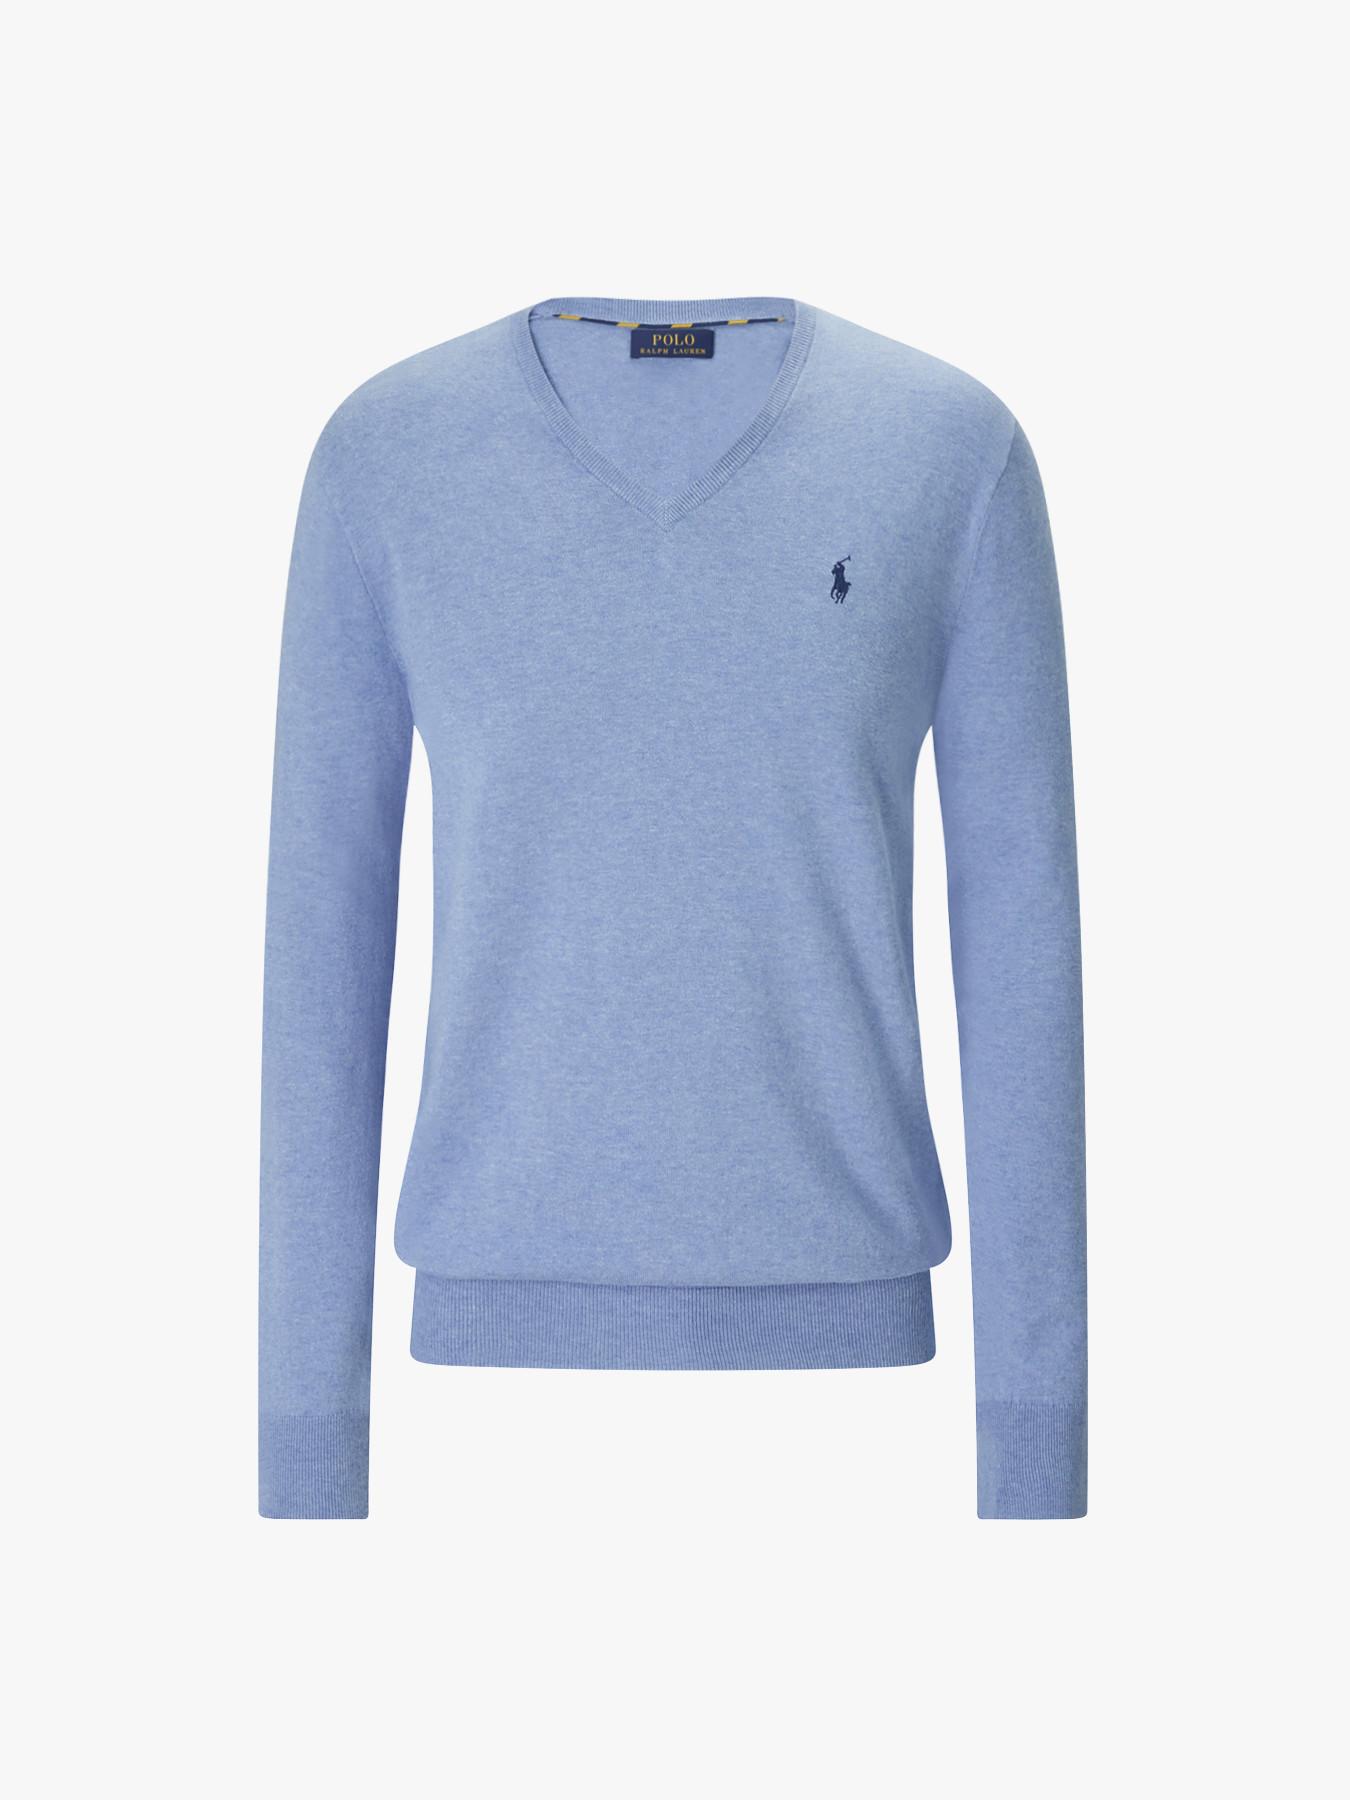 Polo Neck Fit Fenwick SweaterSweatshirts Slim V Ralph Lauren Cotton doWrCQxBe